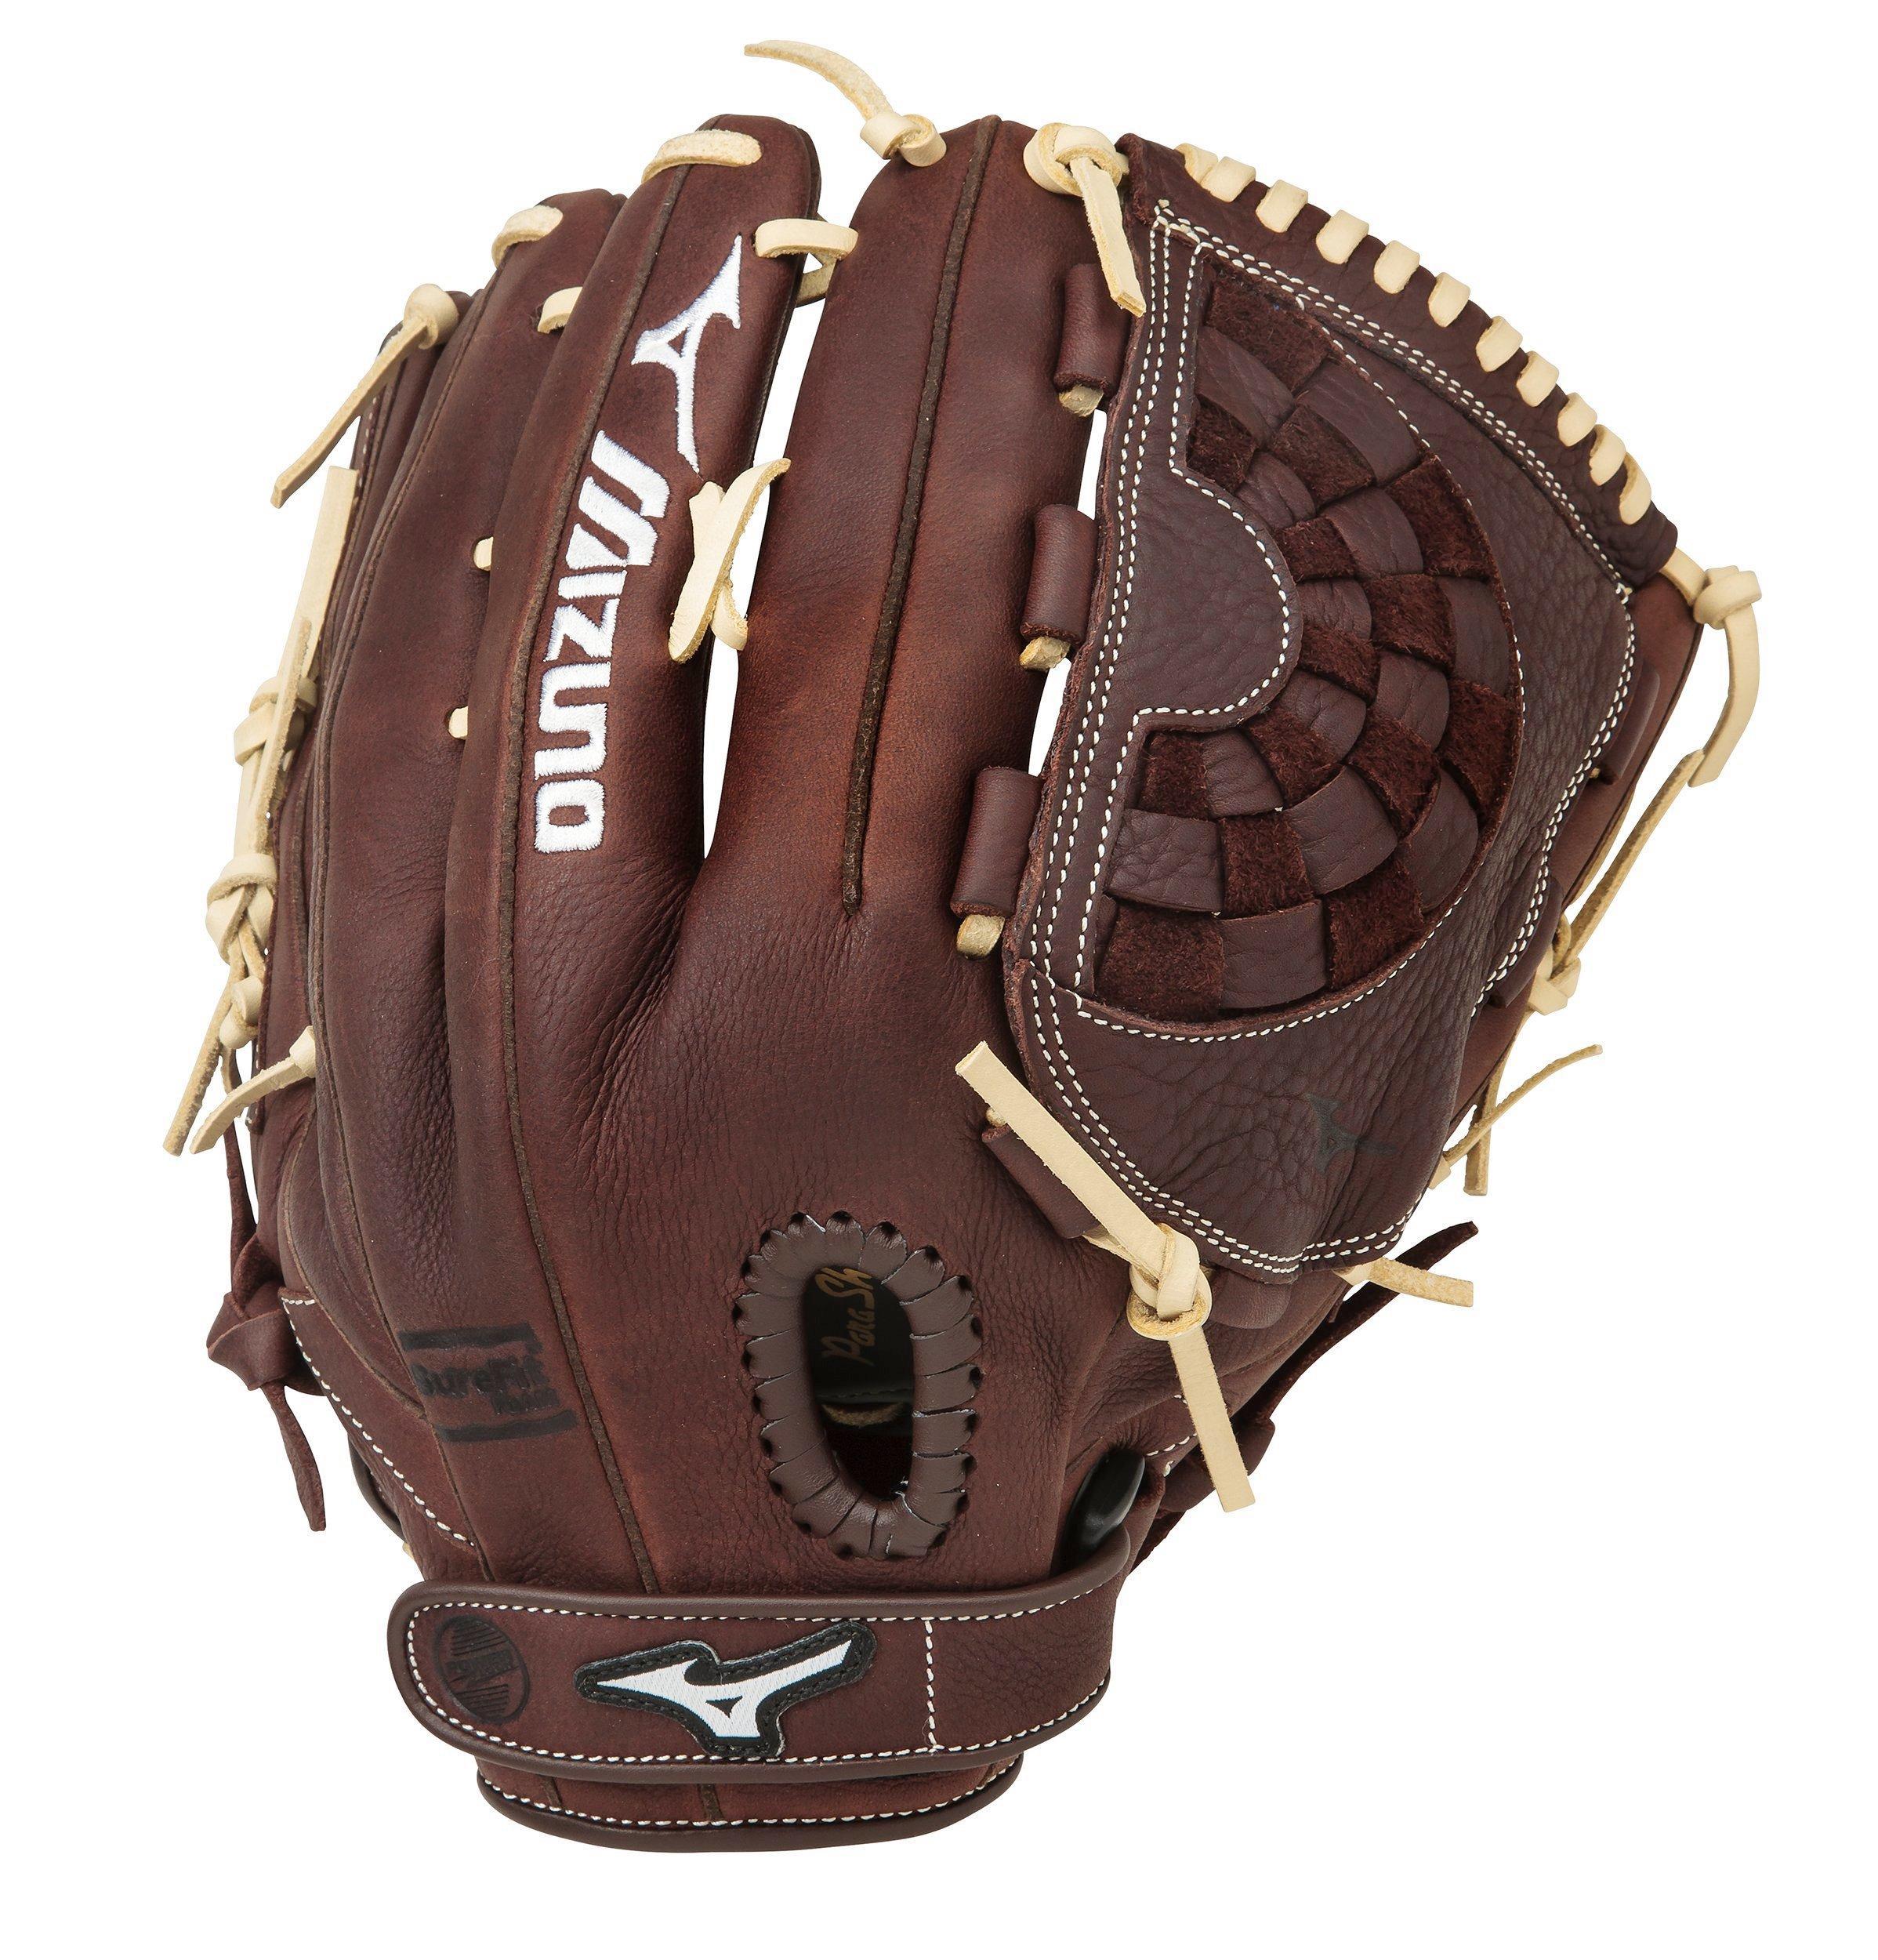 Mizuno Softball Ball Gloves - Frachise Series Fastpitch Softball ...